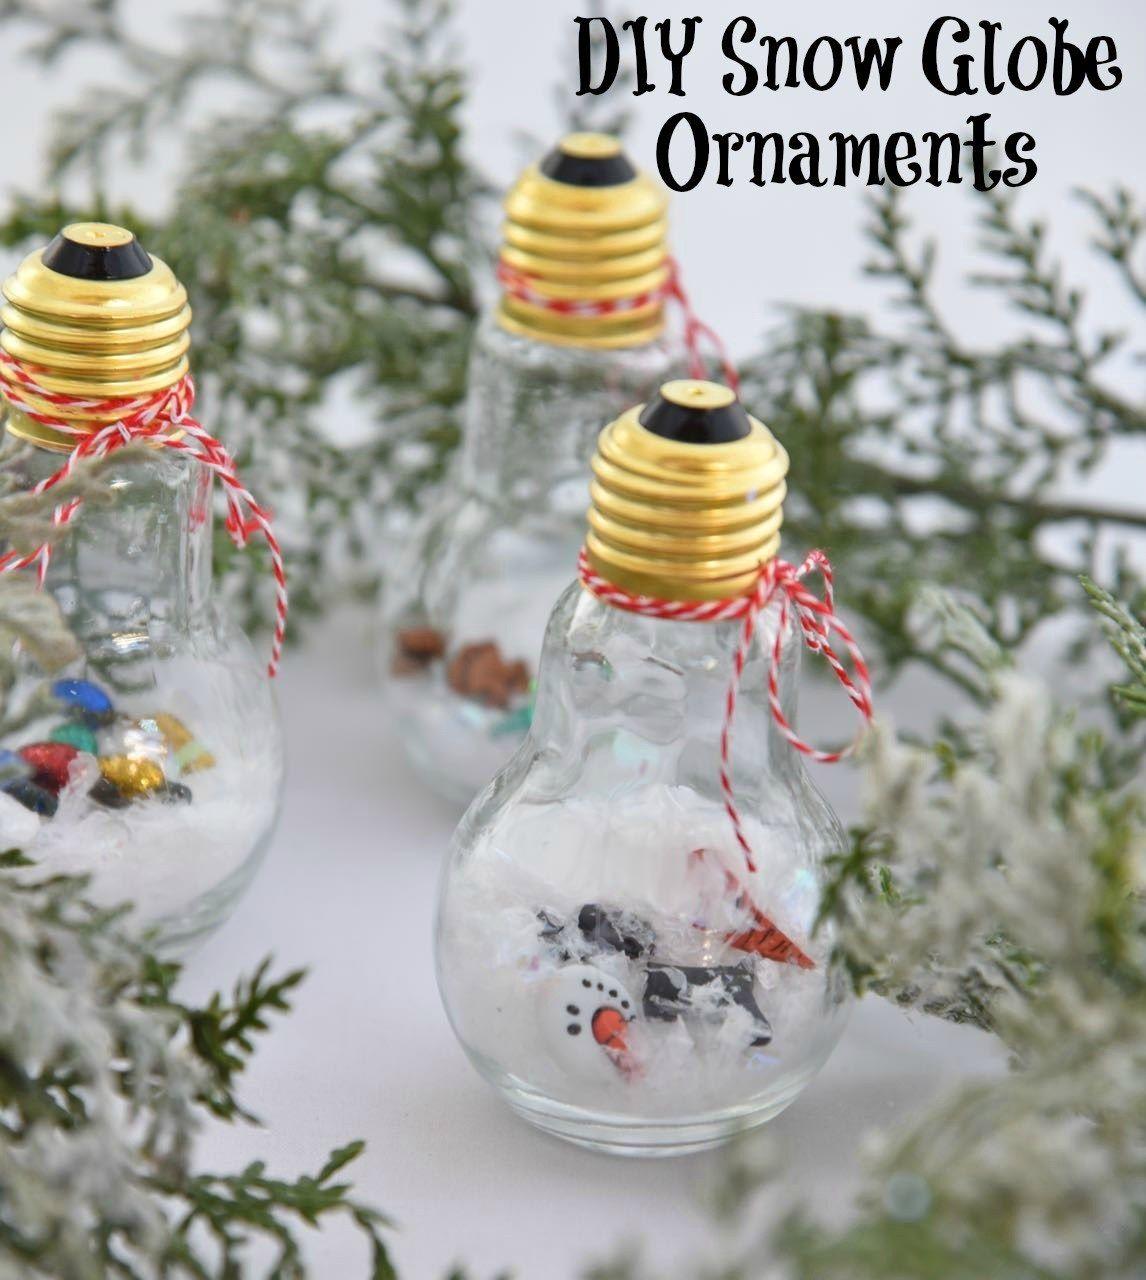 DIY Snow Globe Ornaments (With images) Diy snow globe